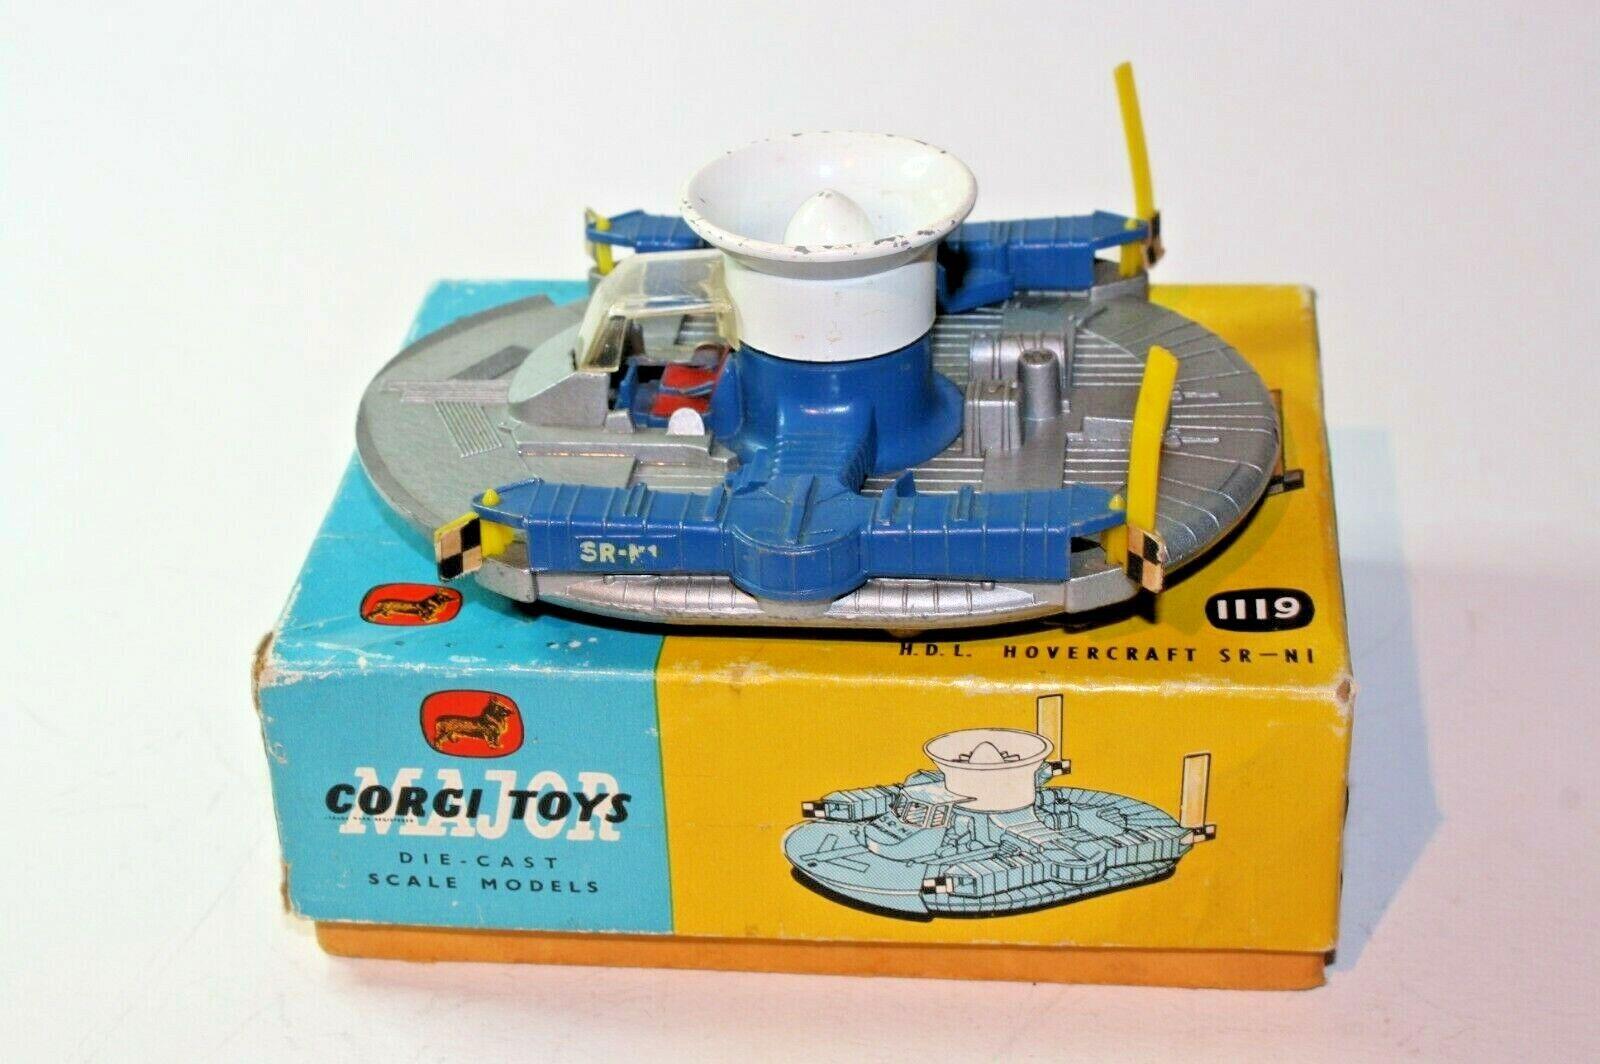 Corgi 1119 HDL Hovercraft, Good Condition in Original Box